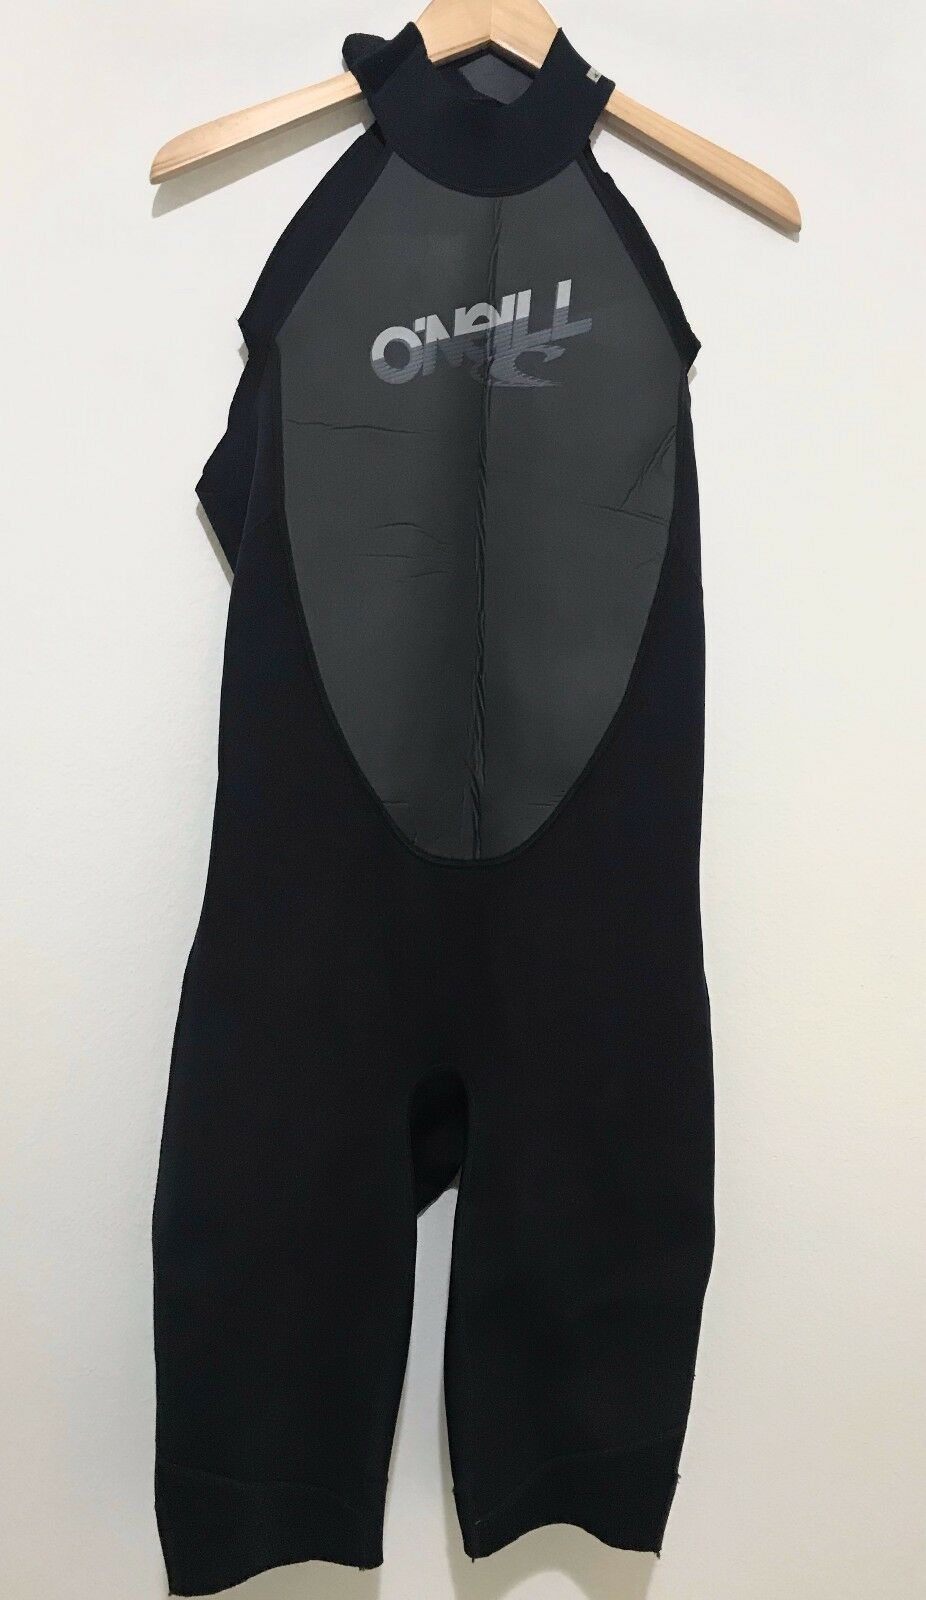 O'Neill Mens Wetsuit Farmer John 3 2 Size Medium M